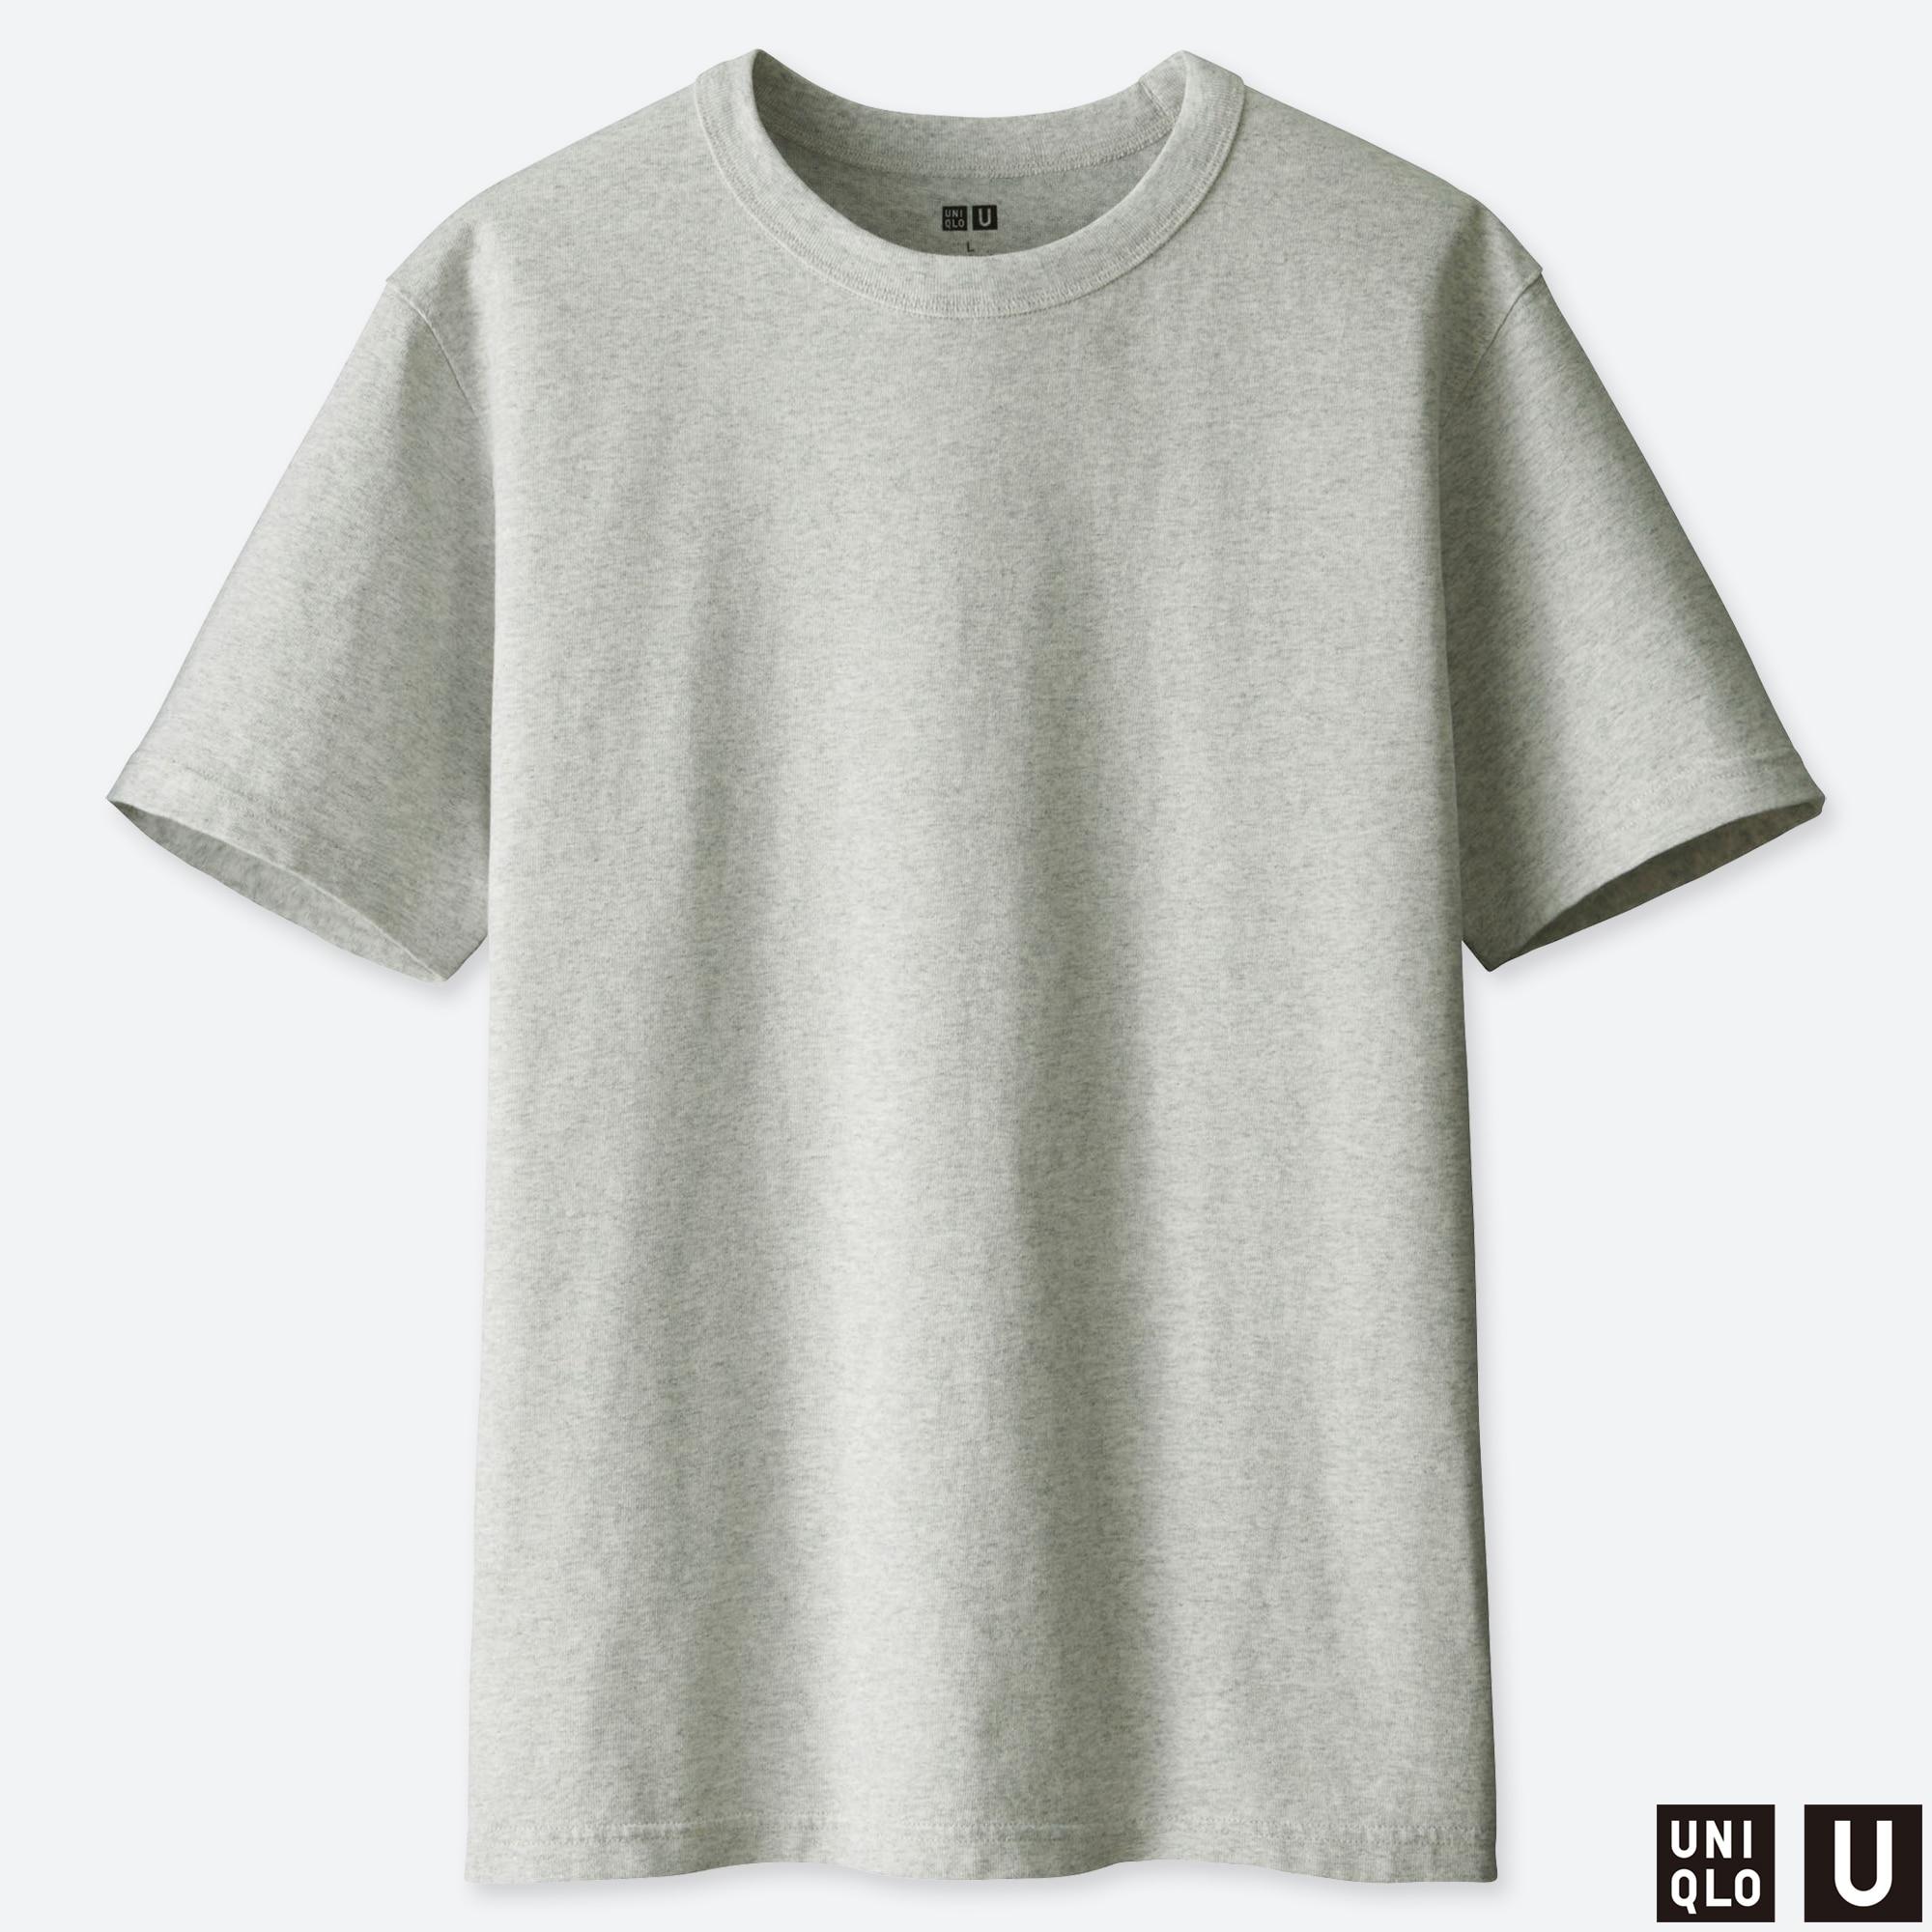 Mens Cool Basic Long-Sleeve Cotton T-Shirt Crew Tee XL Black